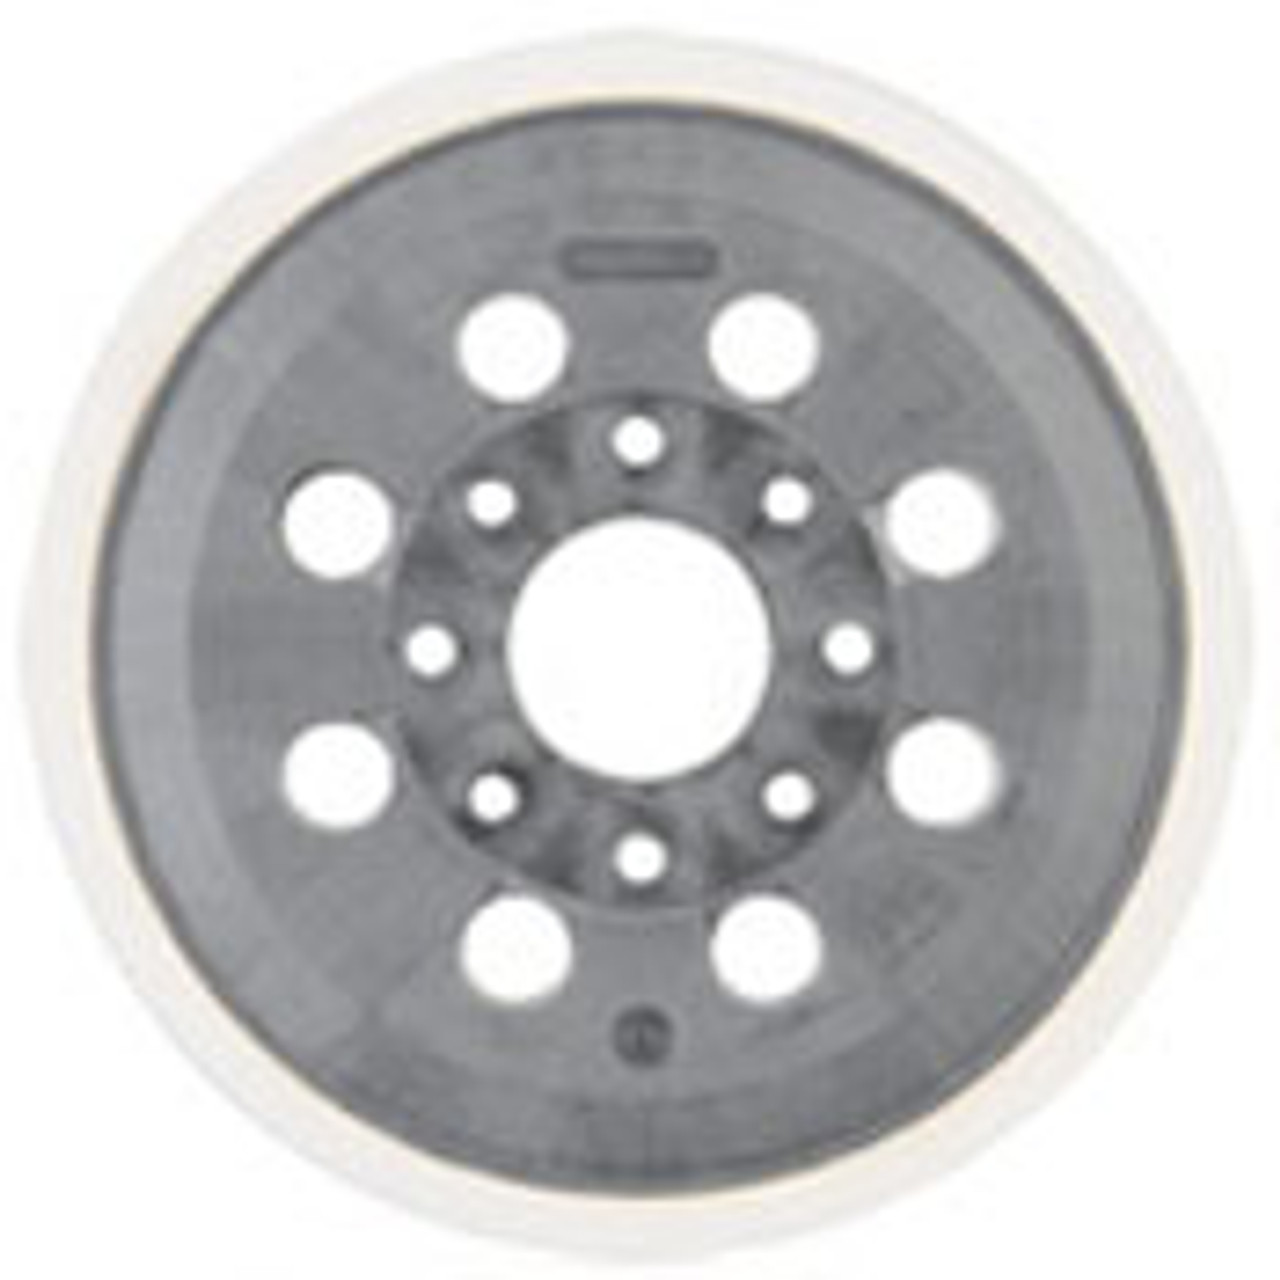 Bosch Hard H&L Backing Pad / ROS20 ROS10